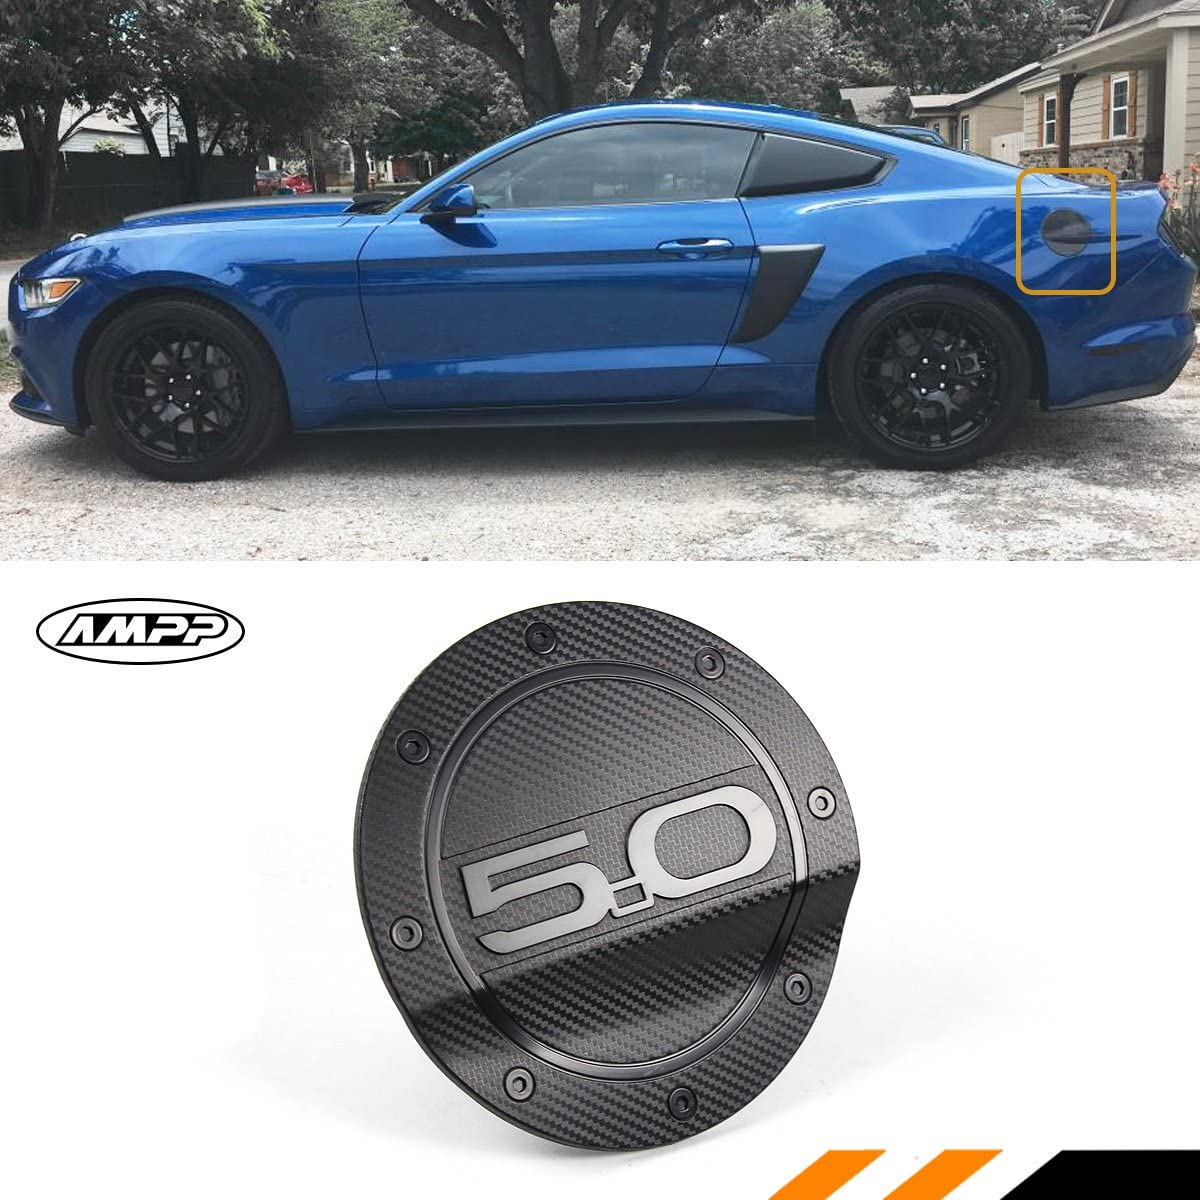 Carbon Fiber ABS Fuel Tank Cover Door Gas Filler Cap Fit for Ford F150 2015-2020